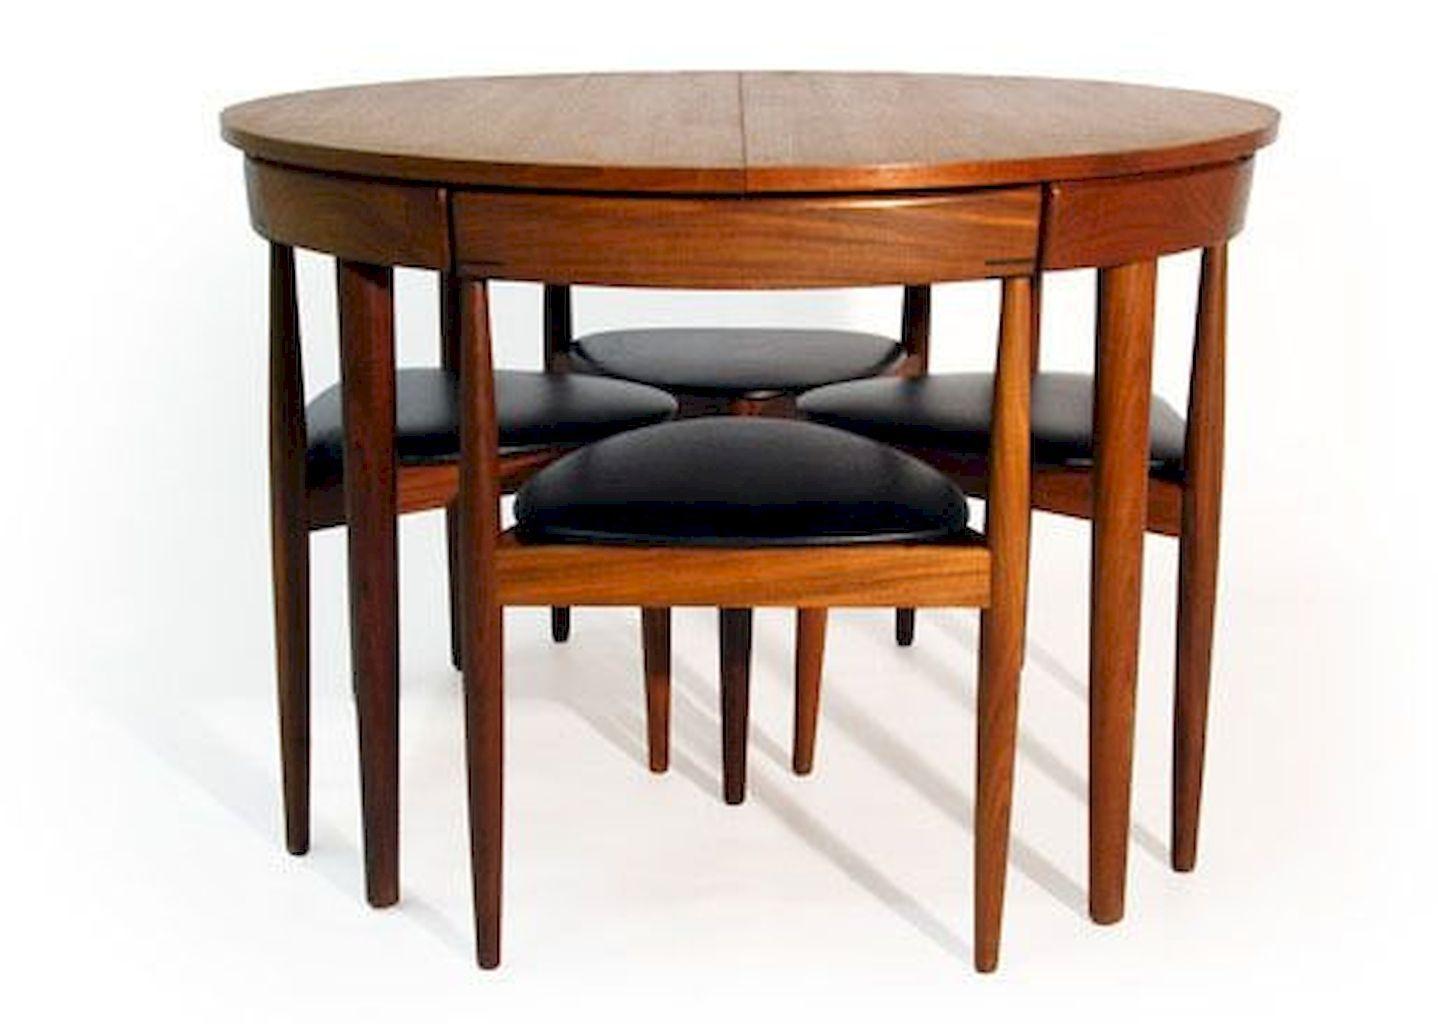 apt size dining table - Heart.impulsar.co